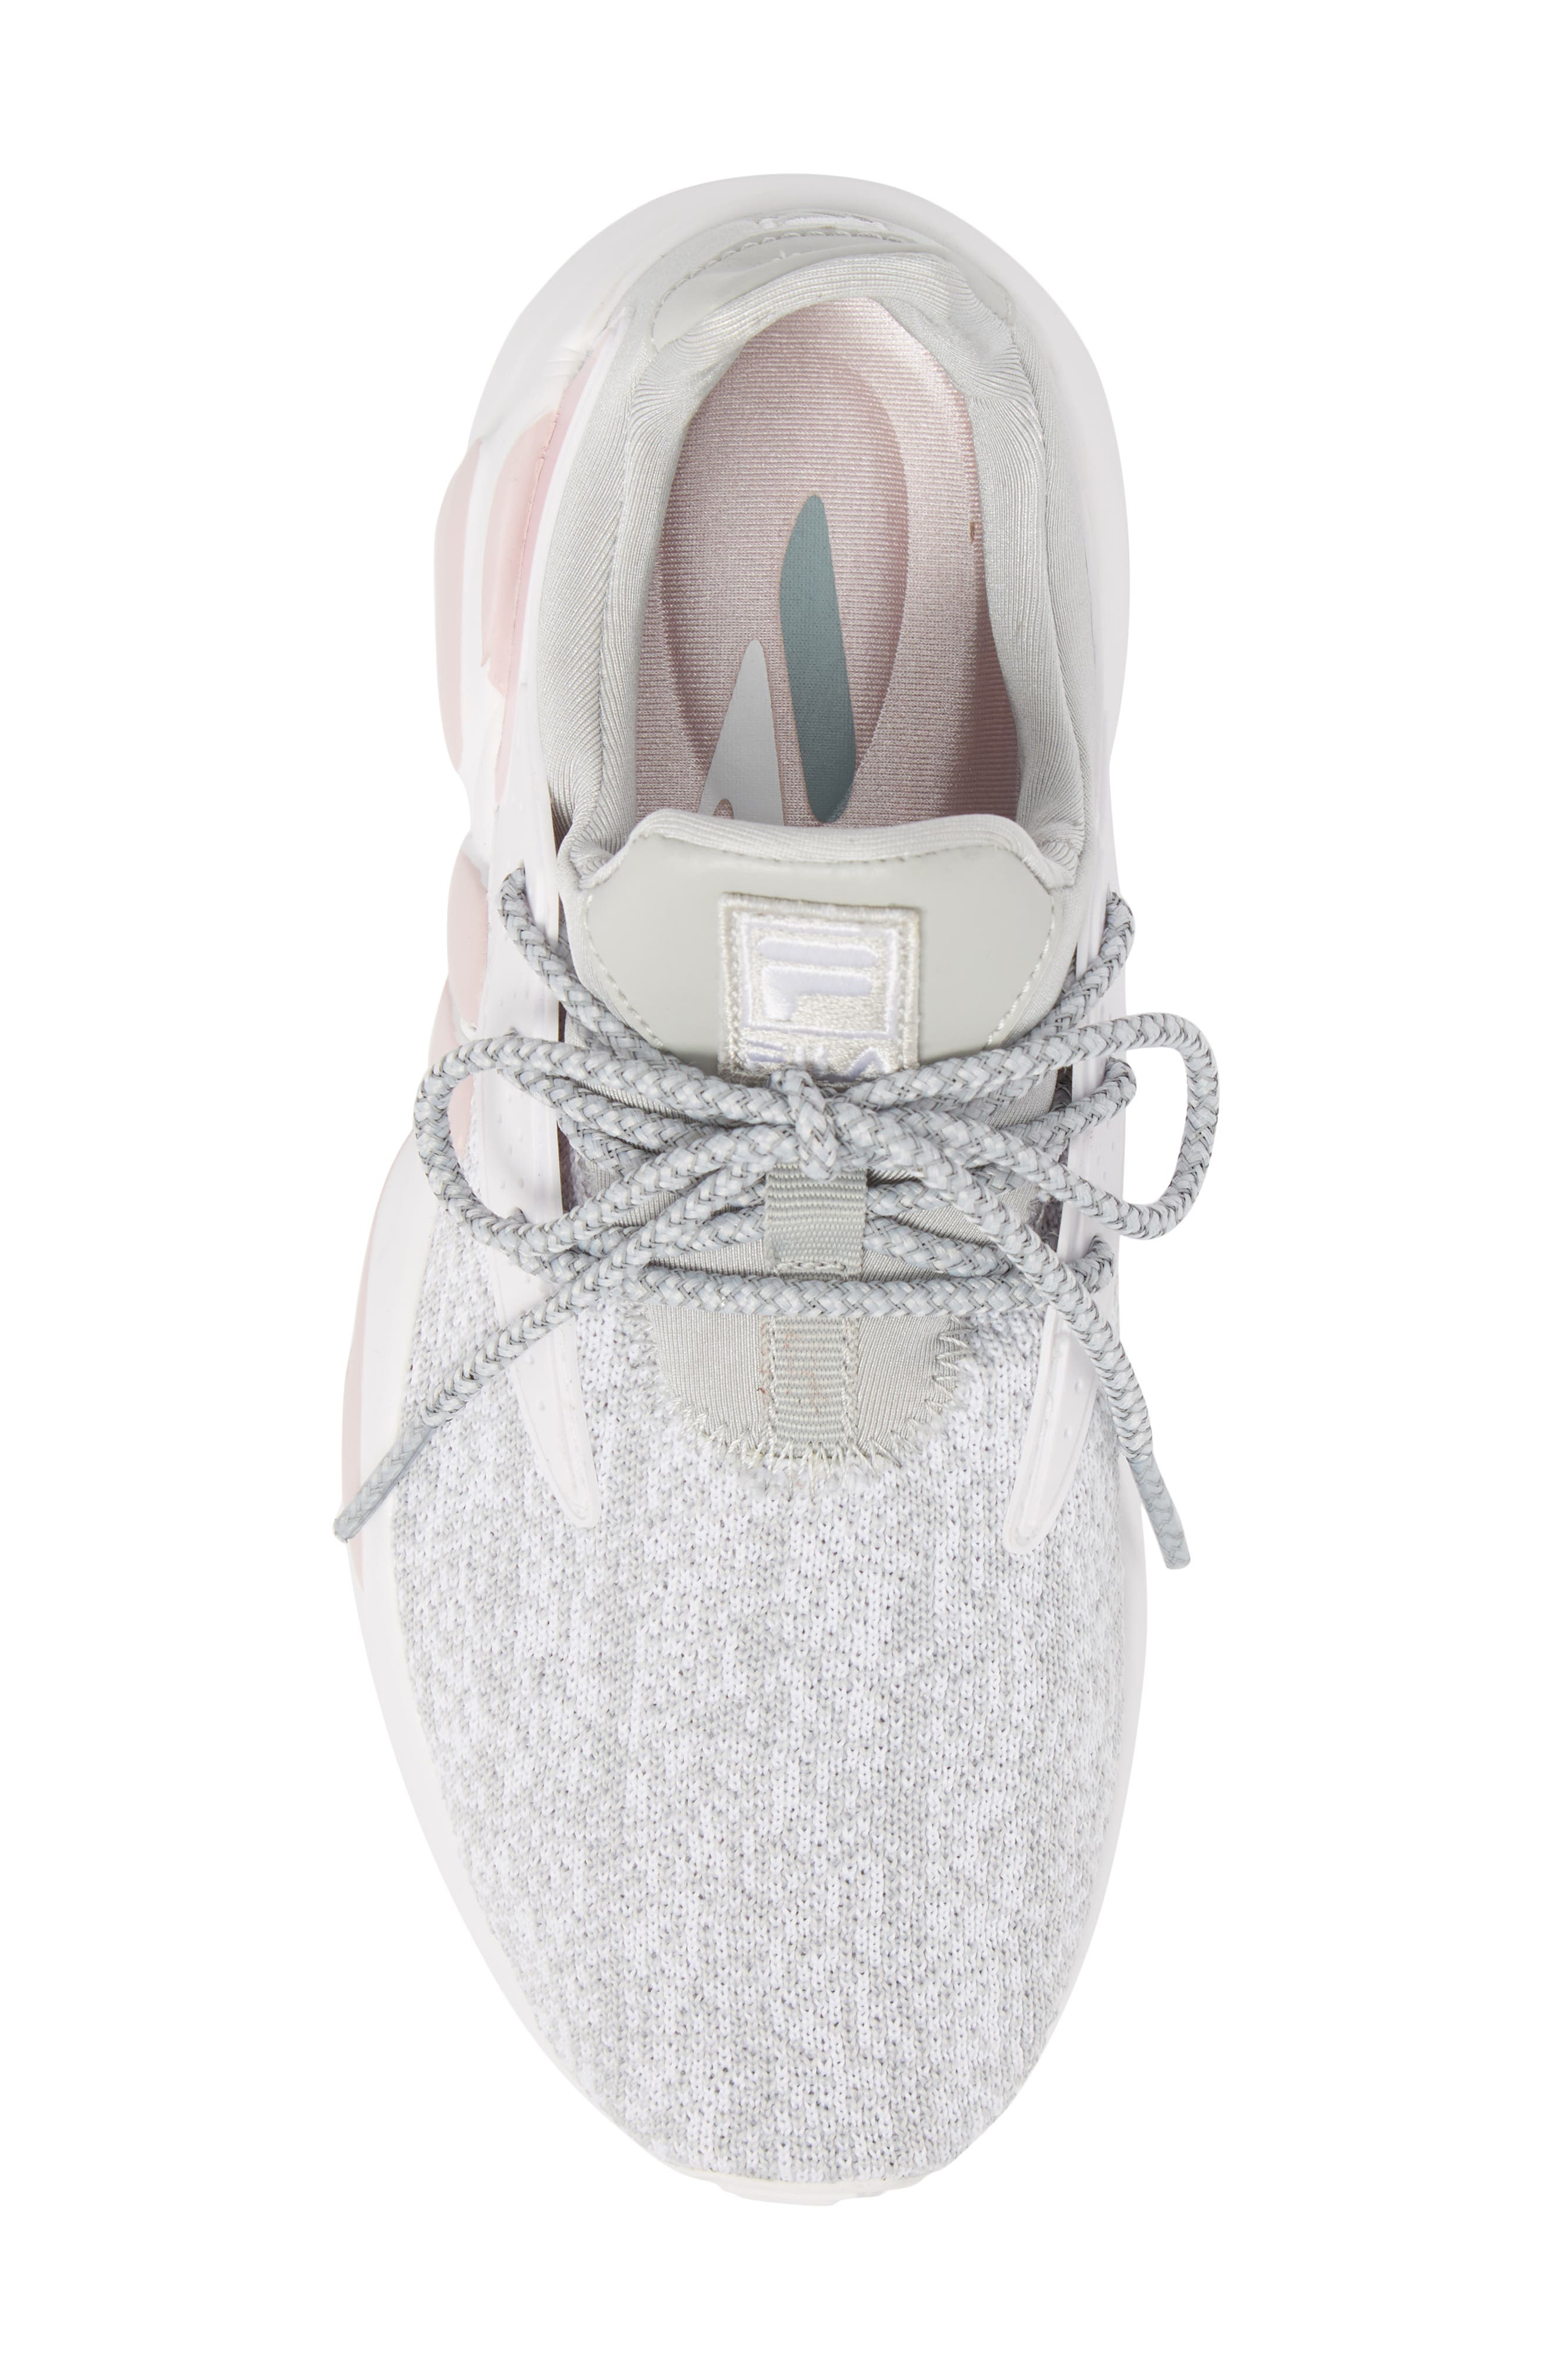 Mindbreaker 2.0 Sneaker,                             Alternate thumbnail 5, color,                             070